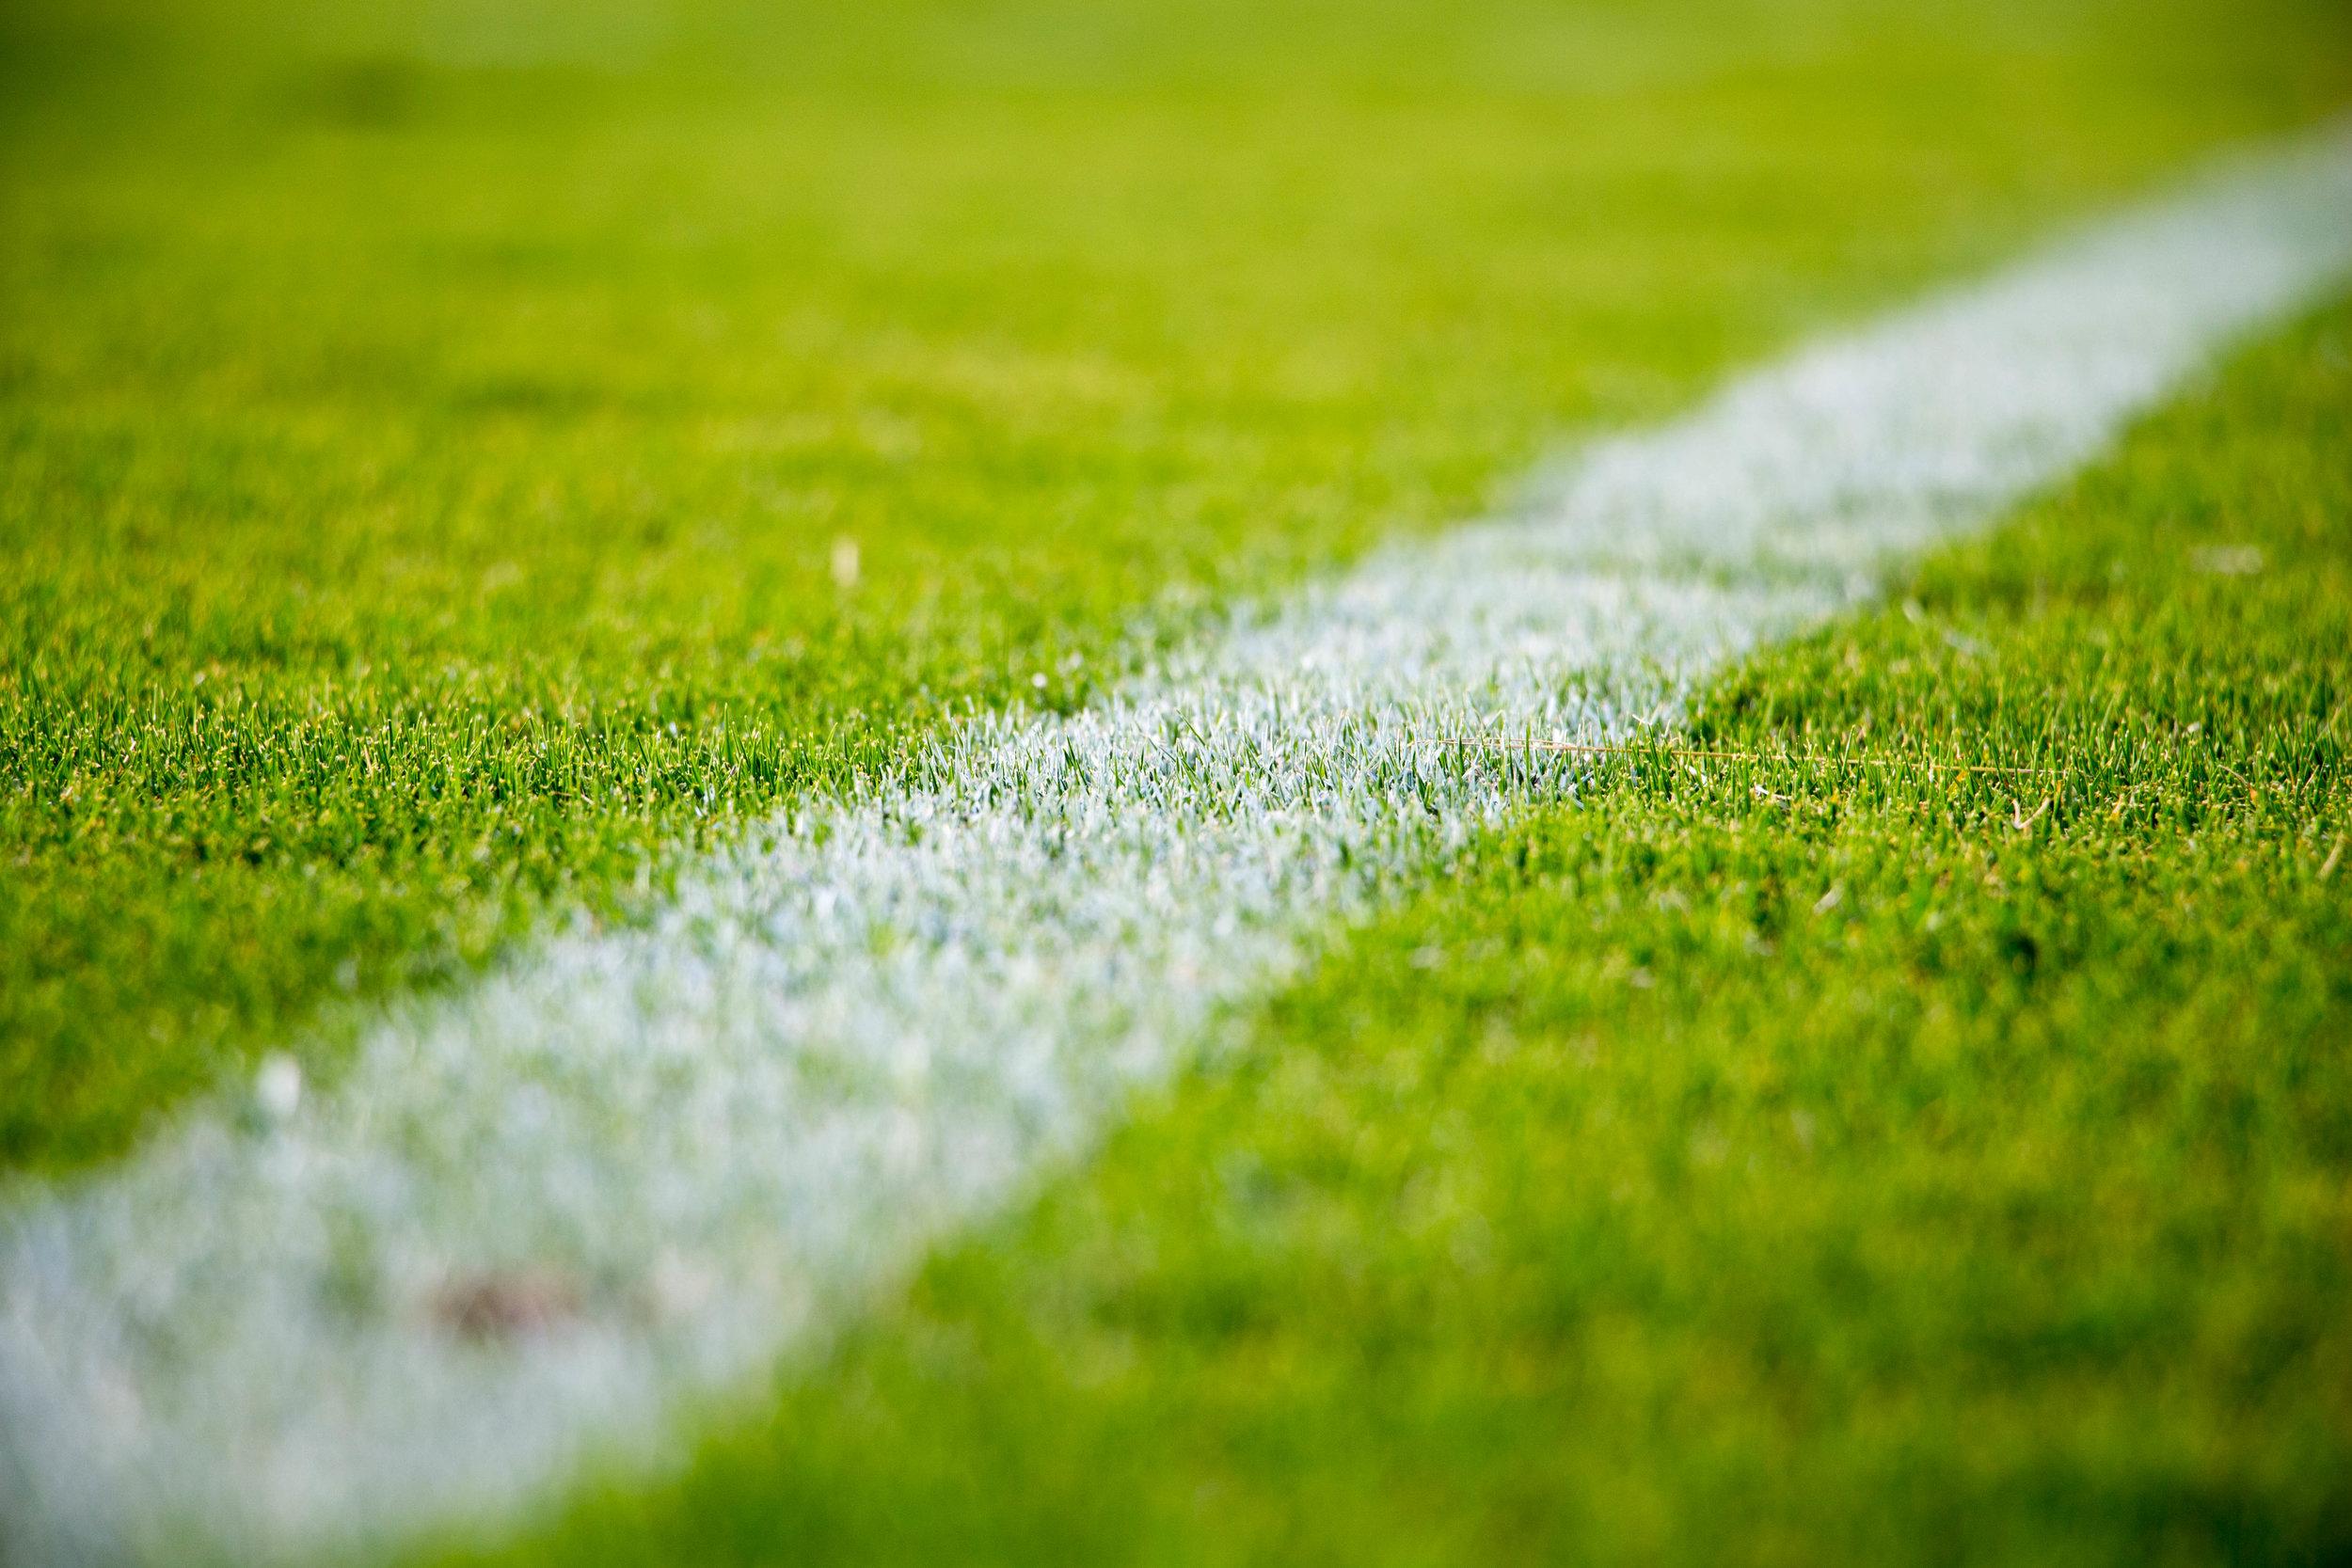 Athletic Schedules - NEXT YEAR SCHEDULE IS TBD.